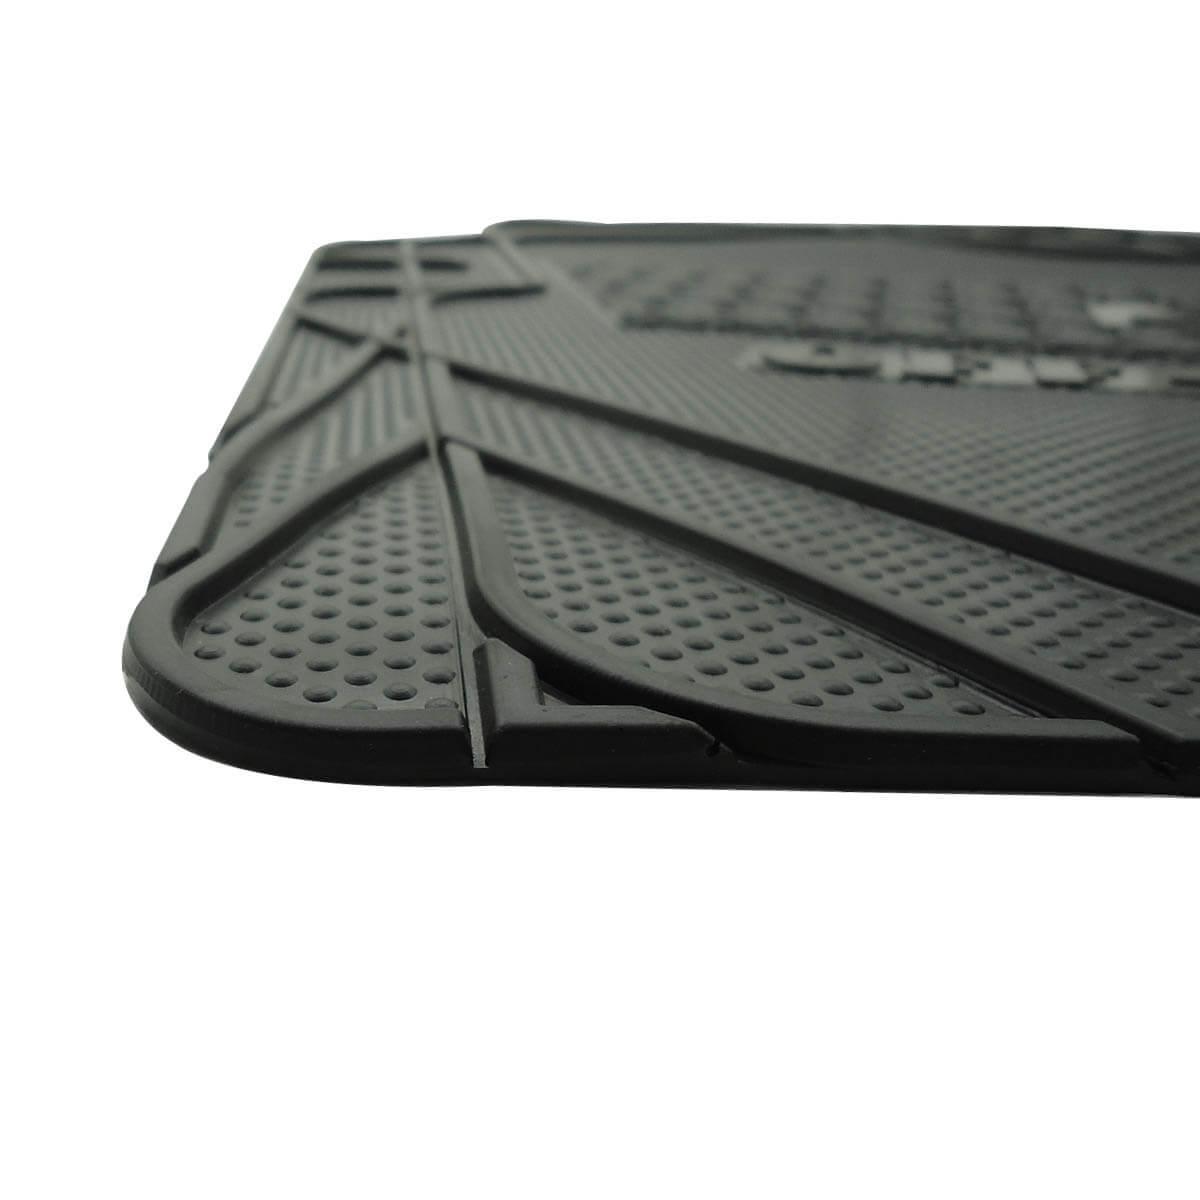 Tapete borracha PVC virgem Nova S10 cabine dupla 2012 a 2022